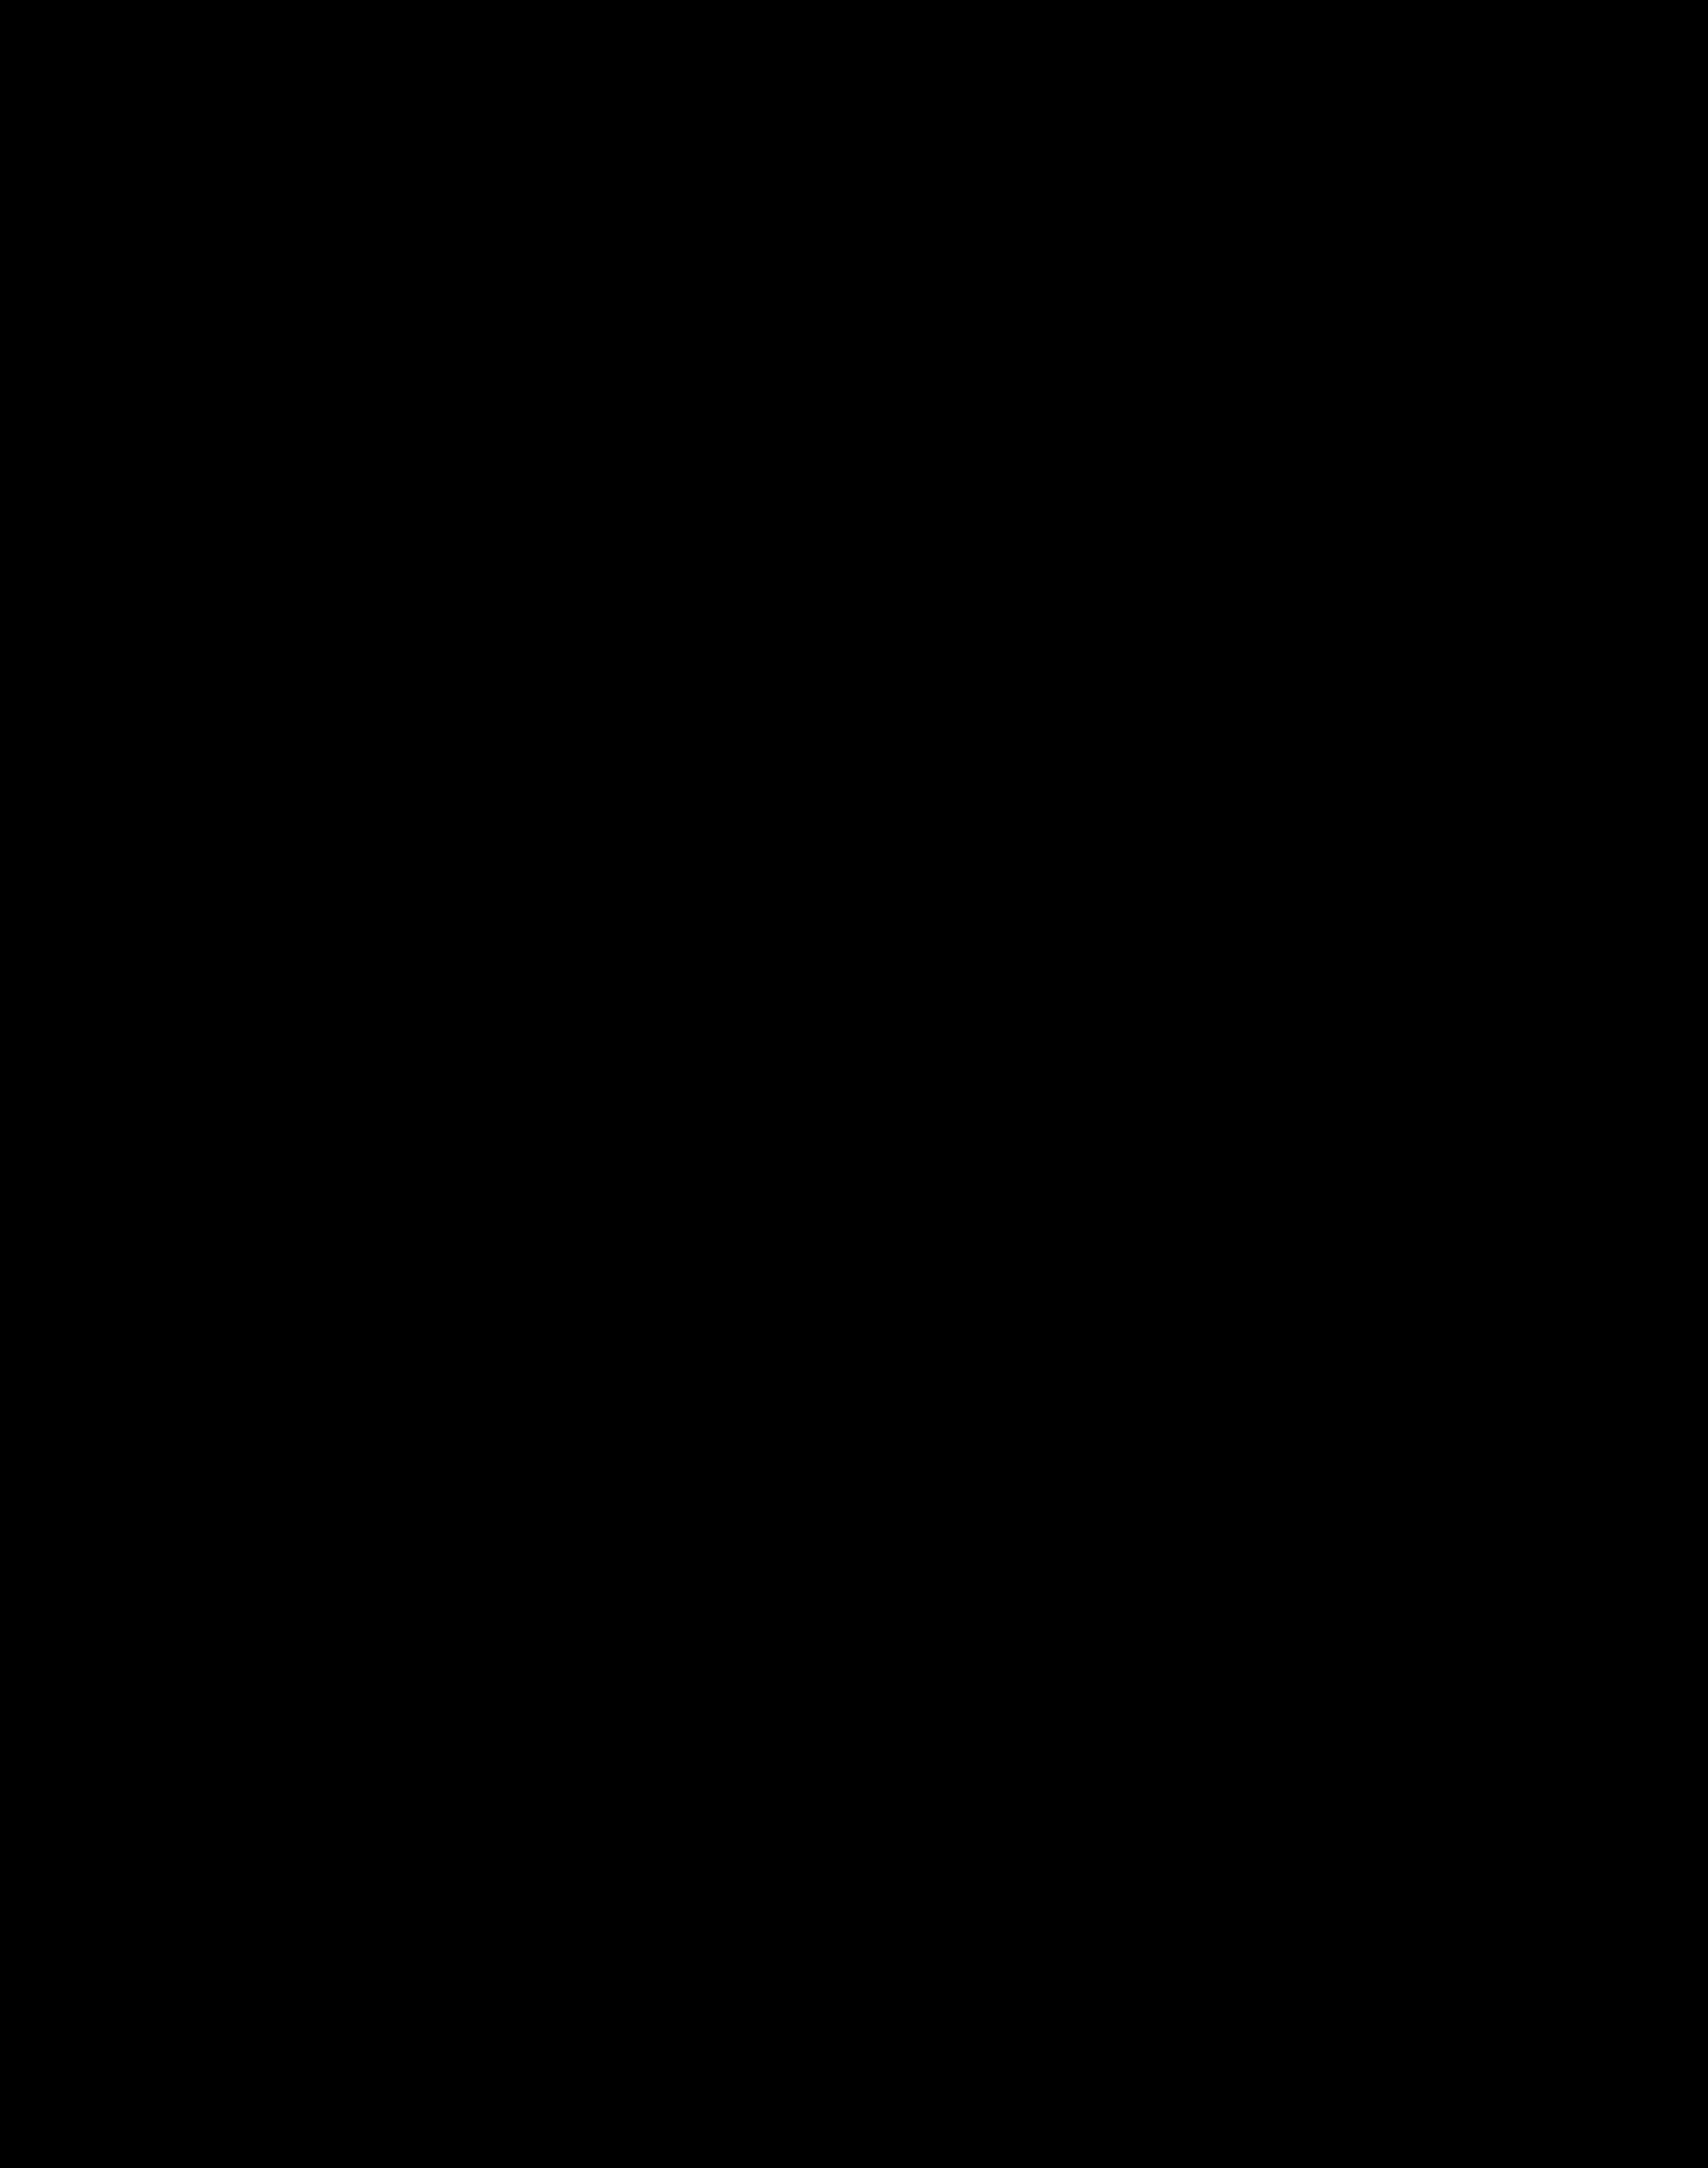 1891x2400 Feet Outline Clip Art Clipart Panda